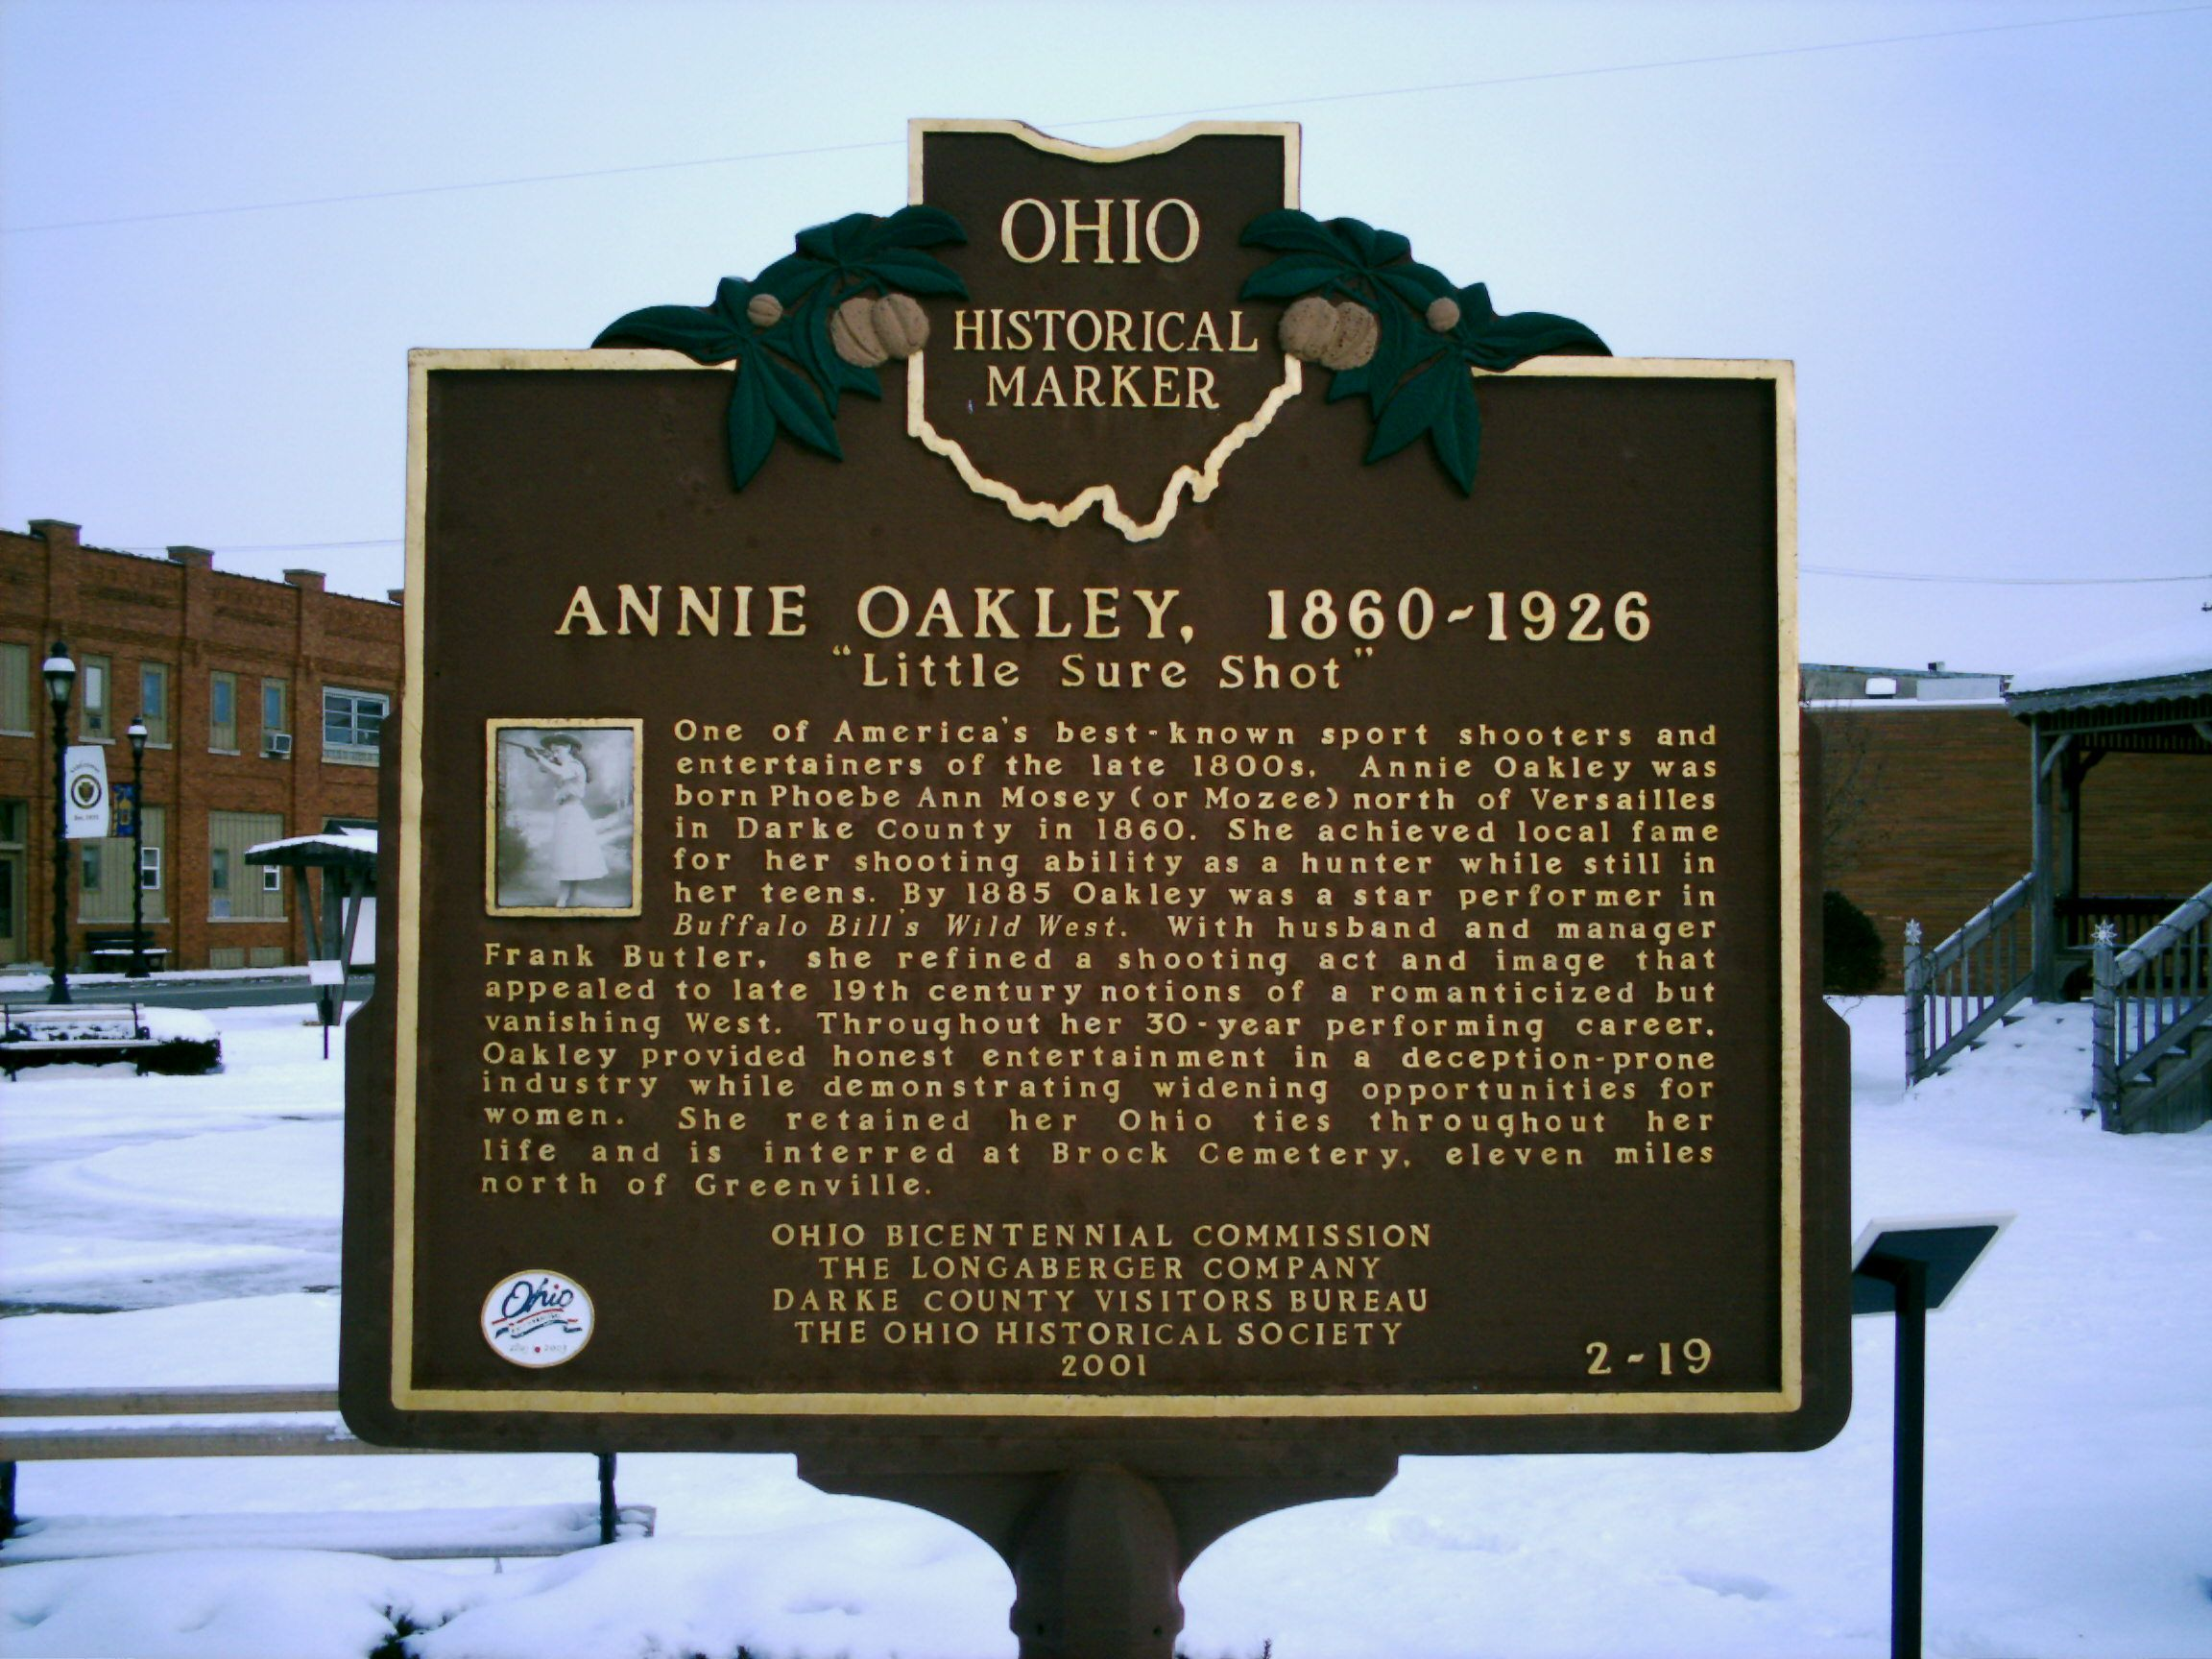 Illinois bureau county ohio - Greenville Oh Darke County Ohio Historical Marker 2 19 At